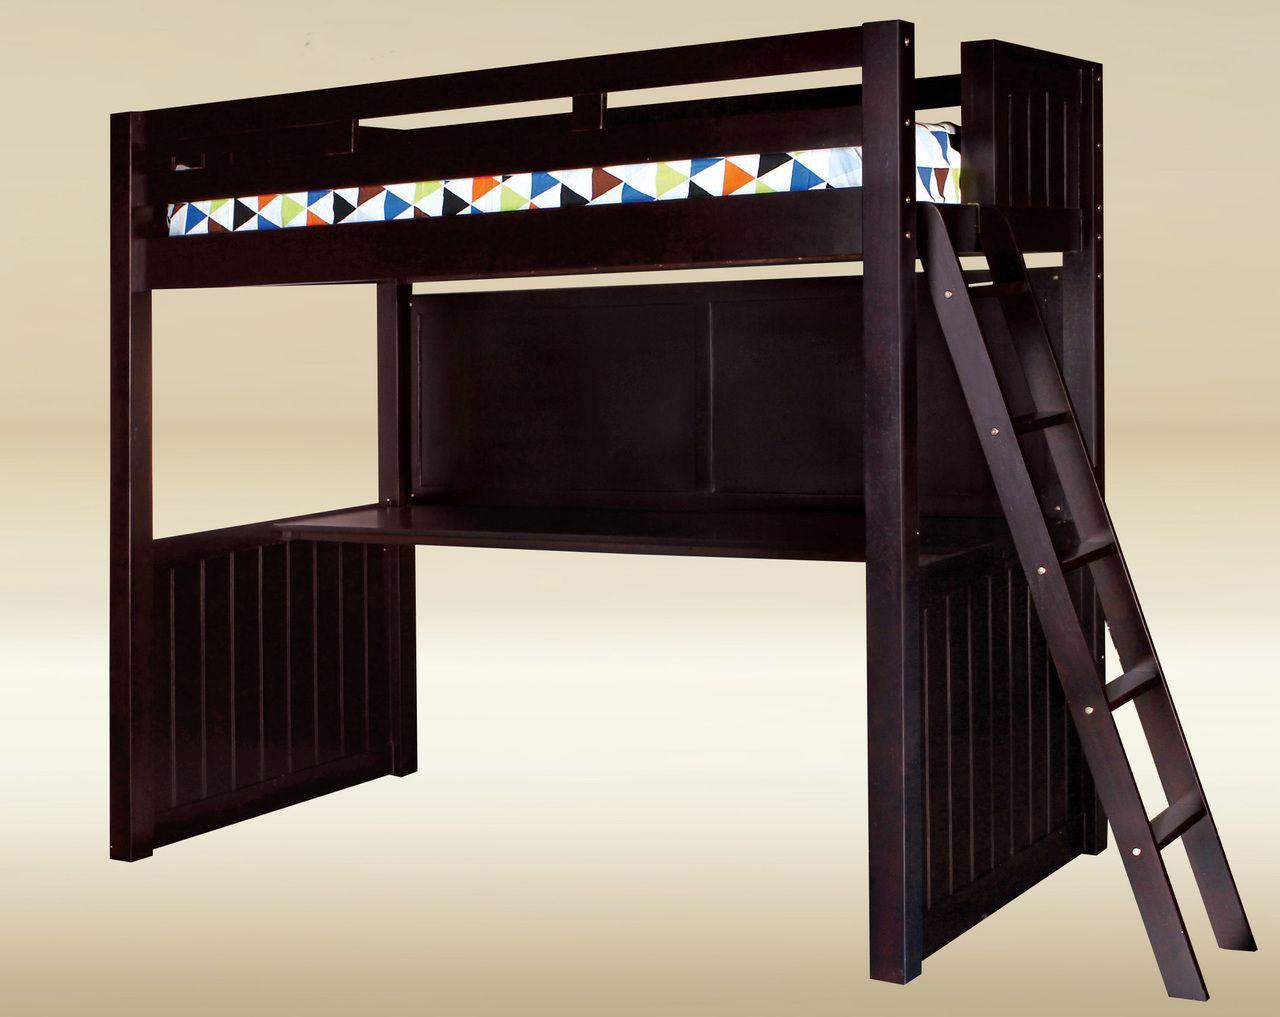 Newcastle Full Loft Bed With Desk Top Below Loft Bed Bed Desk Bed Loft bed with desk full size mattress